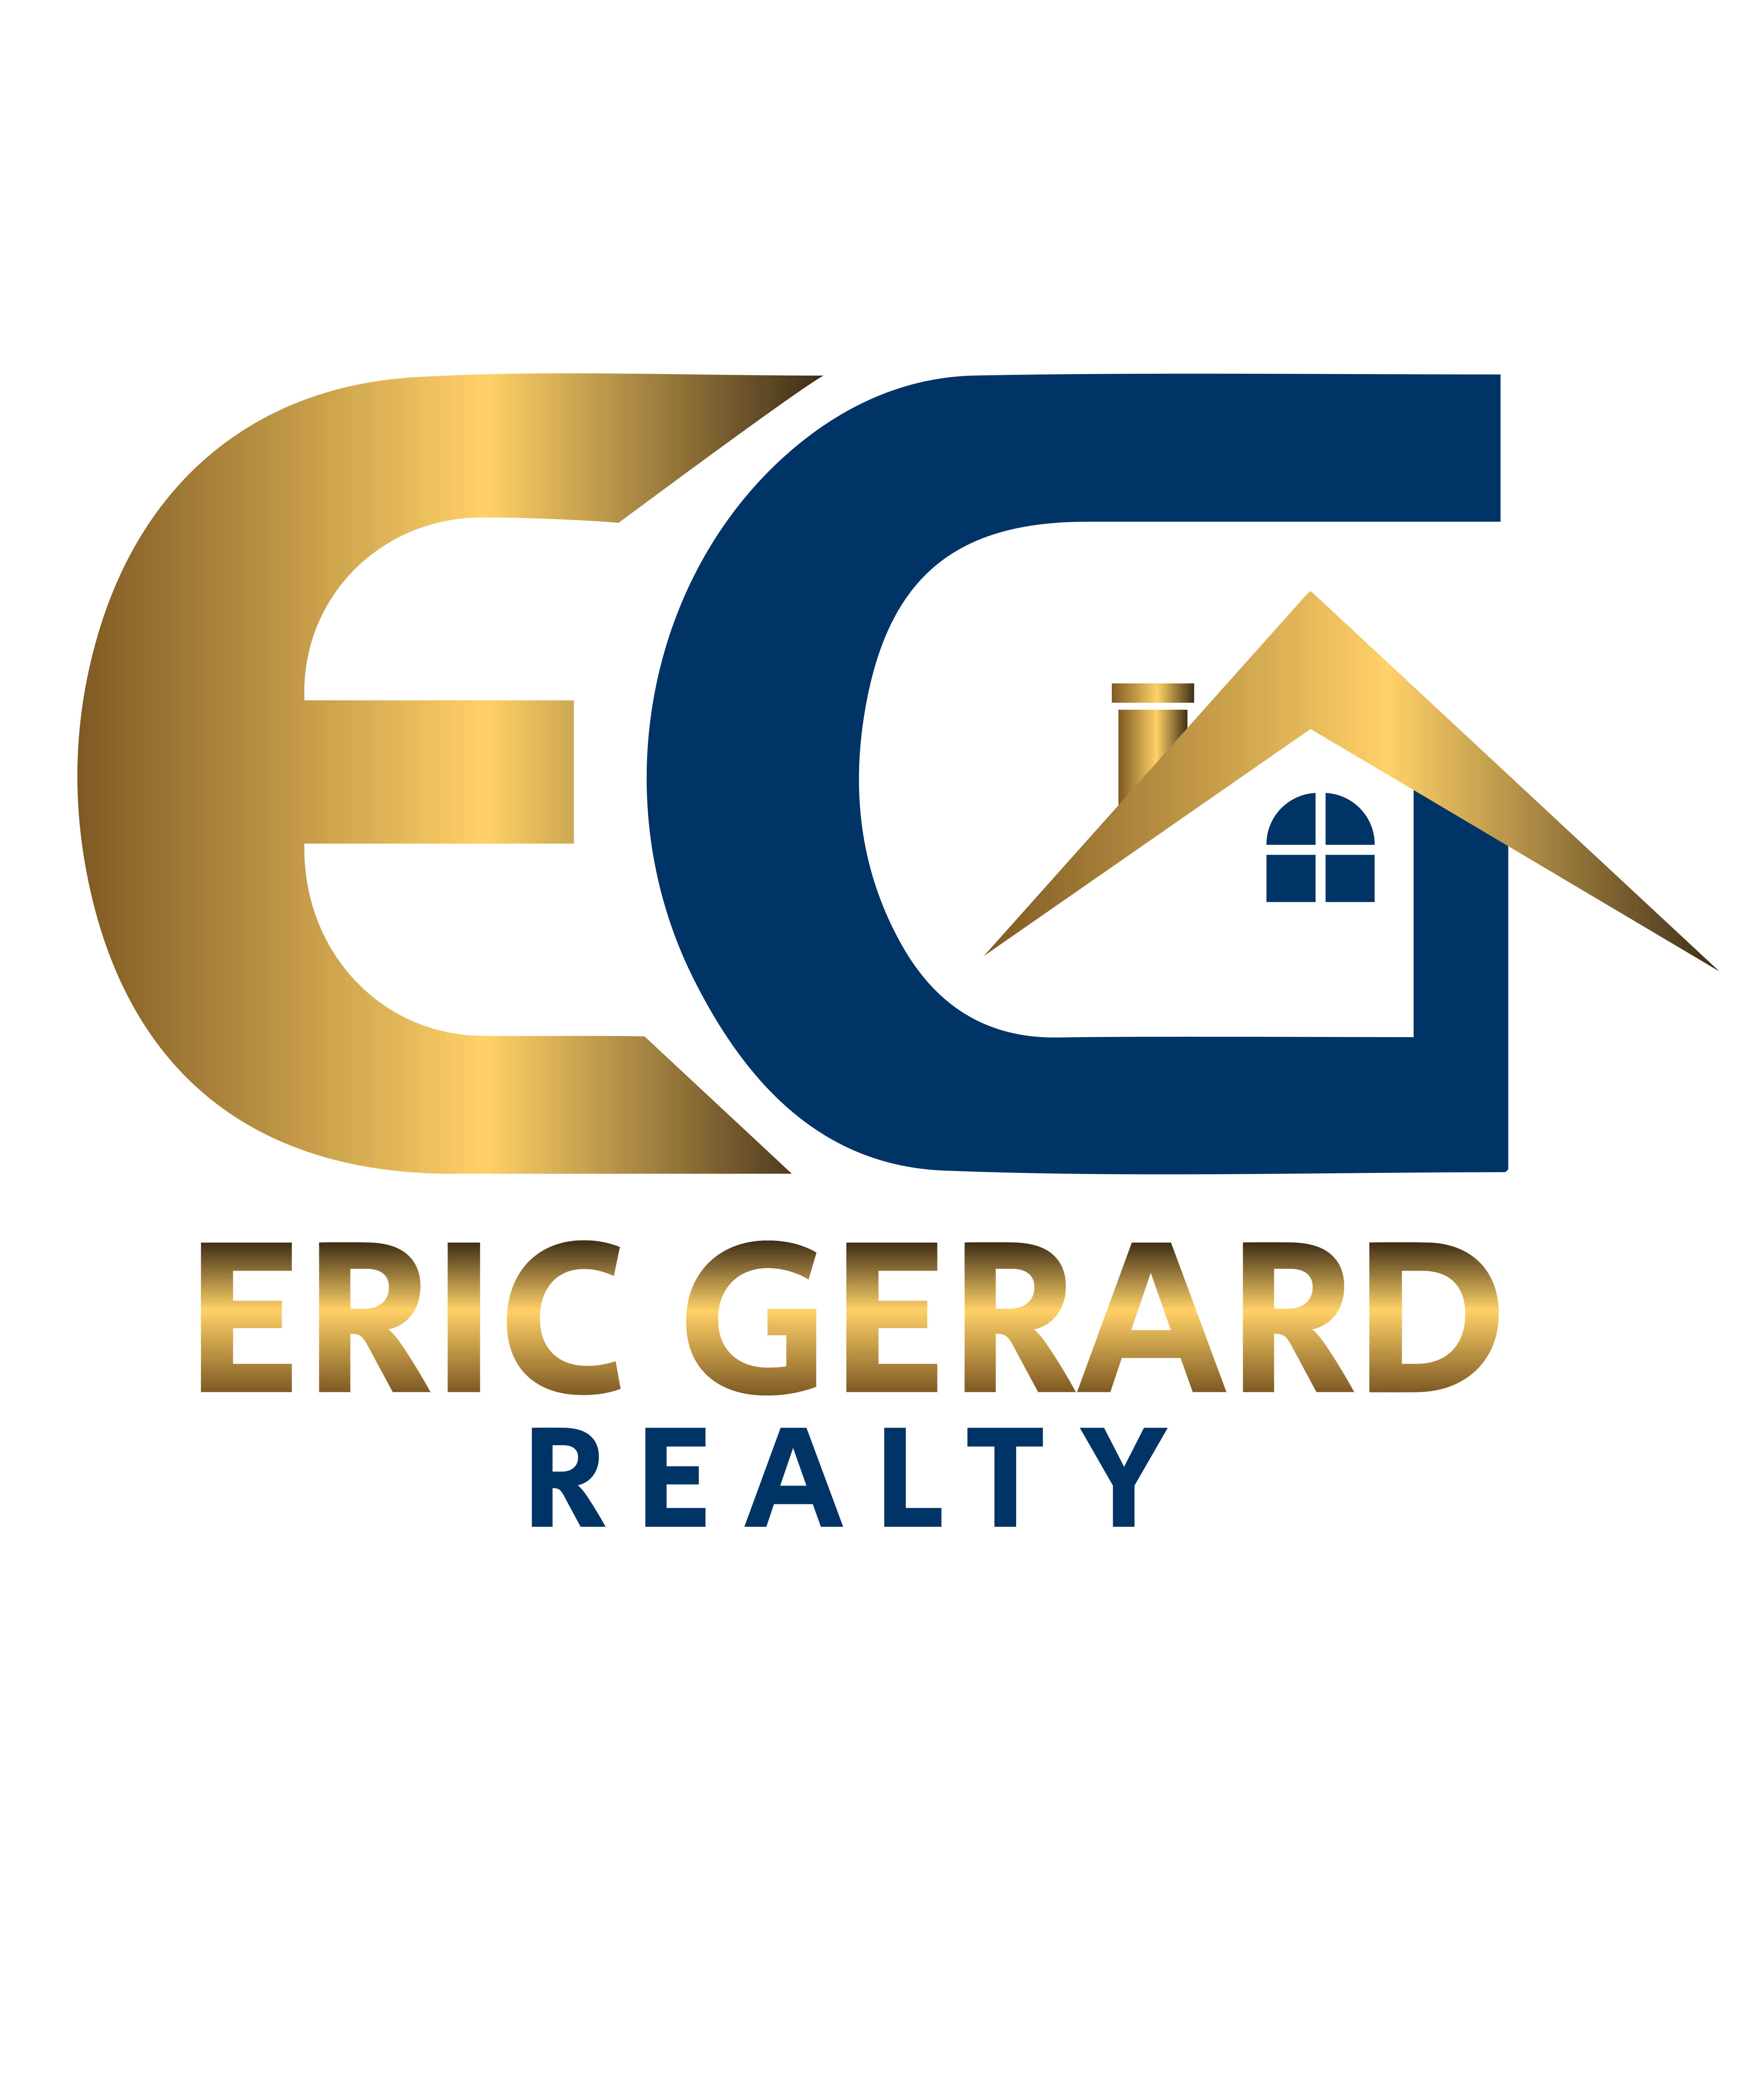 Eric Gerard Realty logo